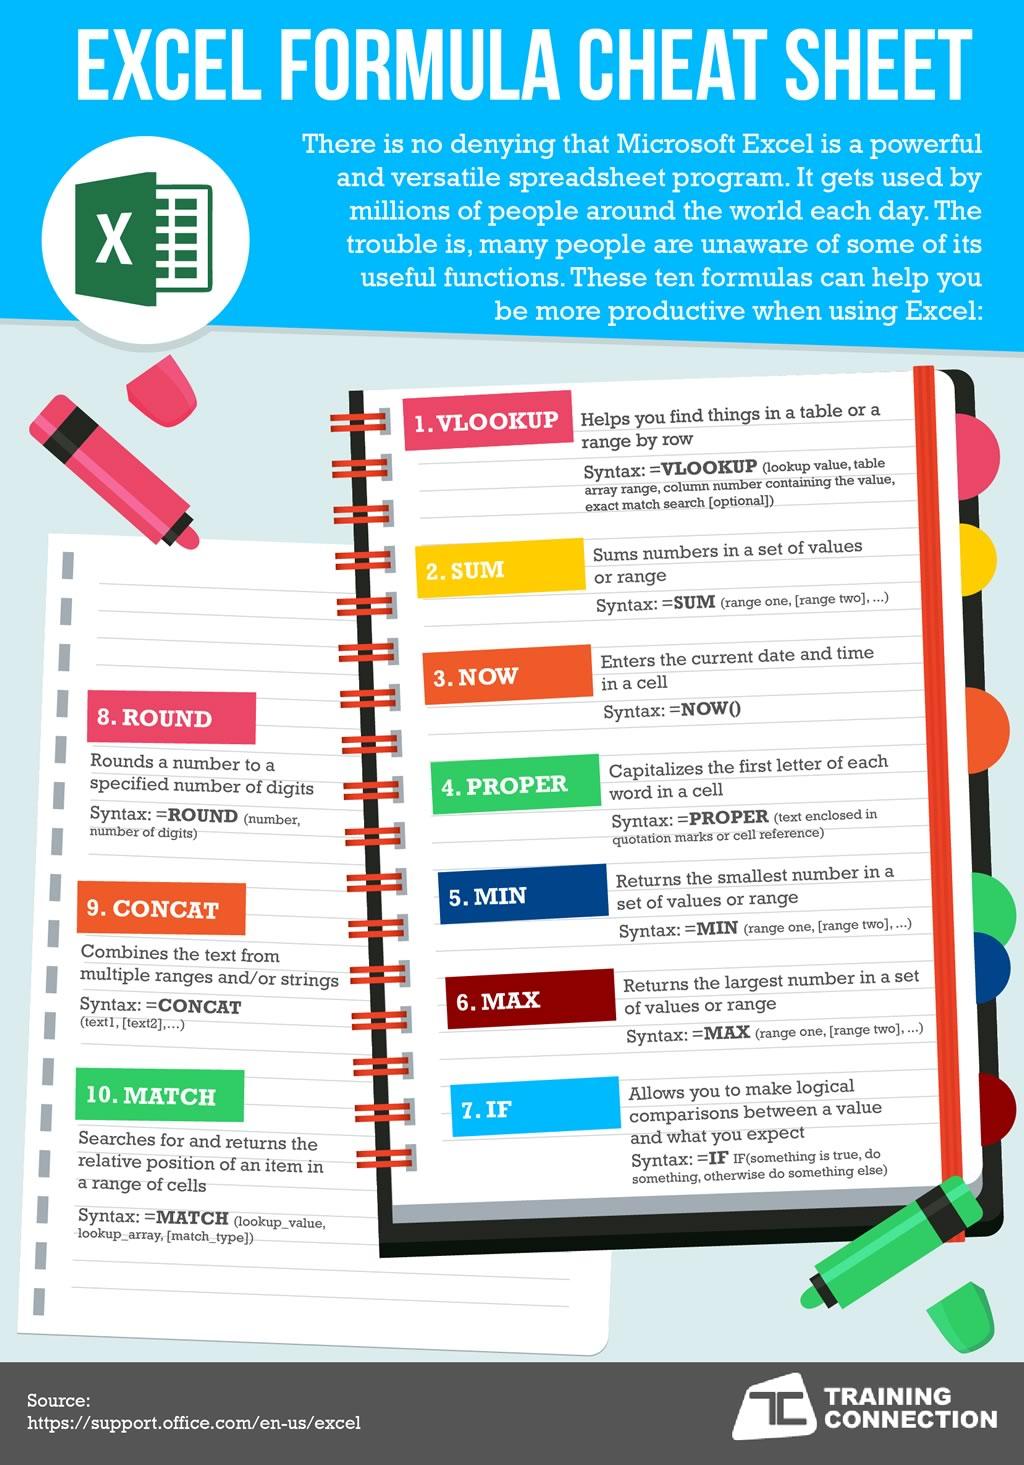 Excel 2013 formula cheat sheet pdf